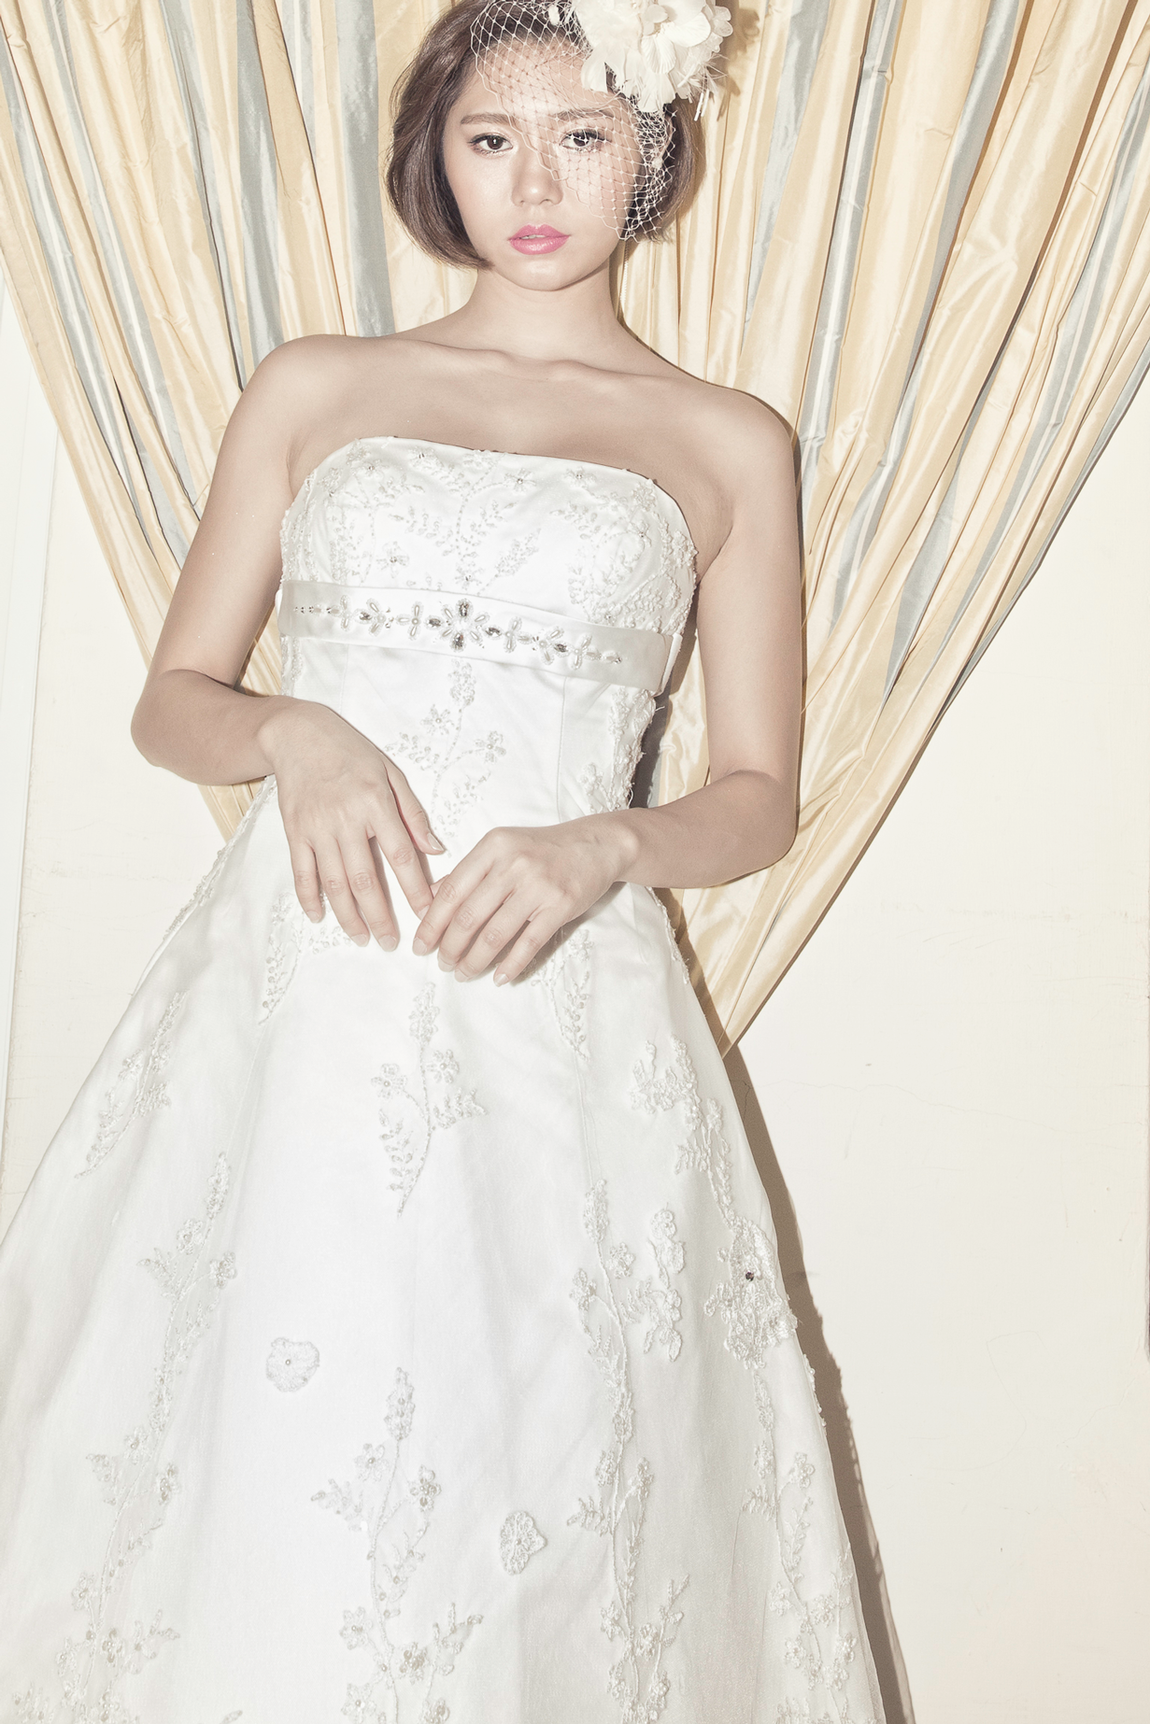 LOVE M STUDIO - Pre-wedding-5